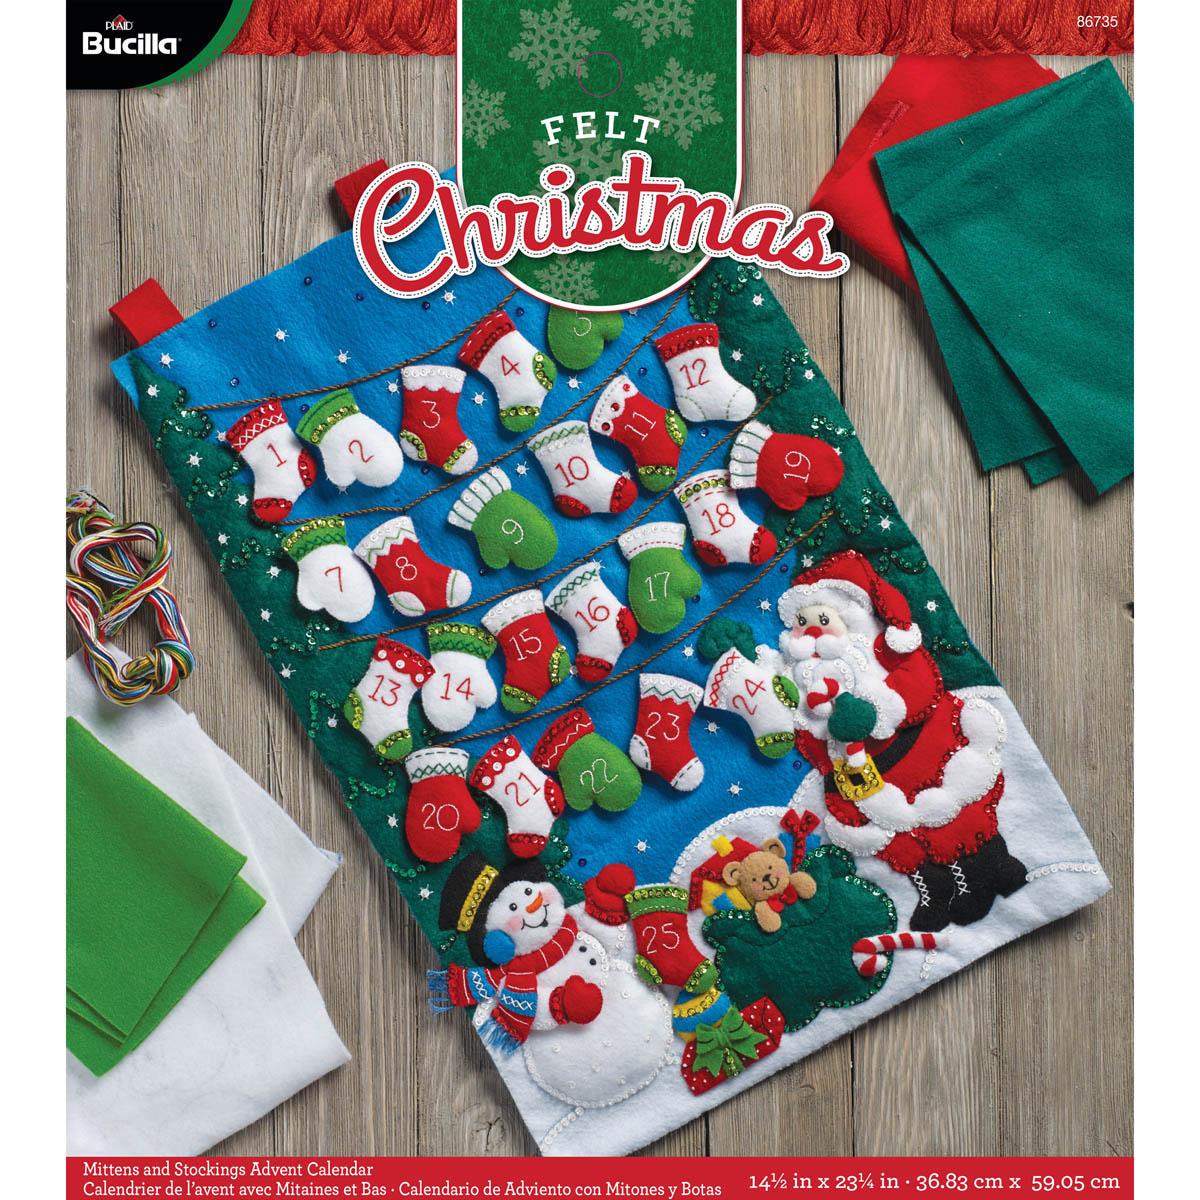 Bucilla ® Seasonal - Felt - Home Decor - Advent Calendar Kits - Mittens & Stockings